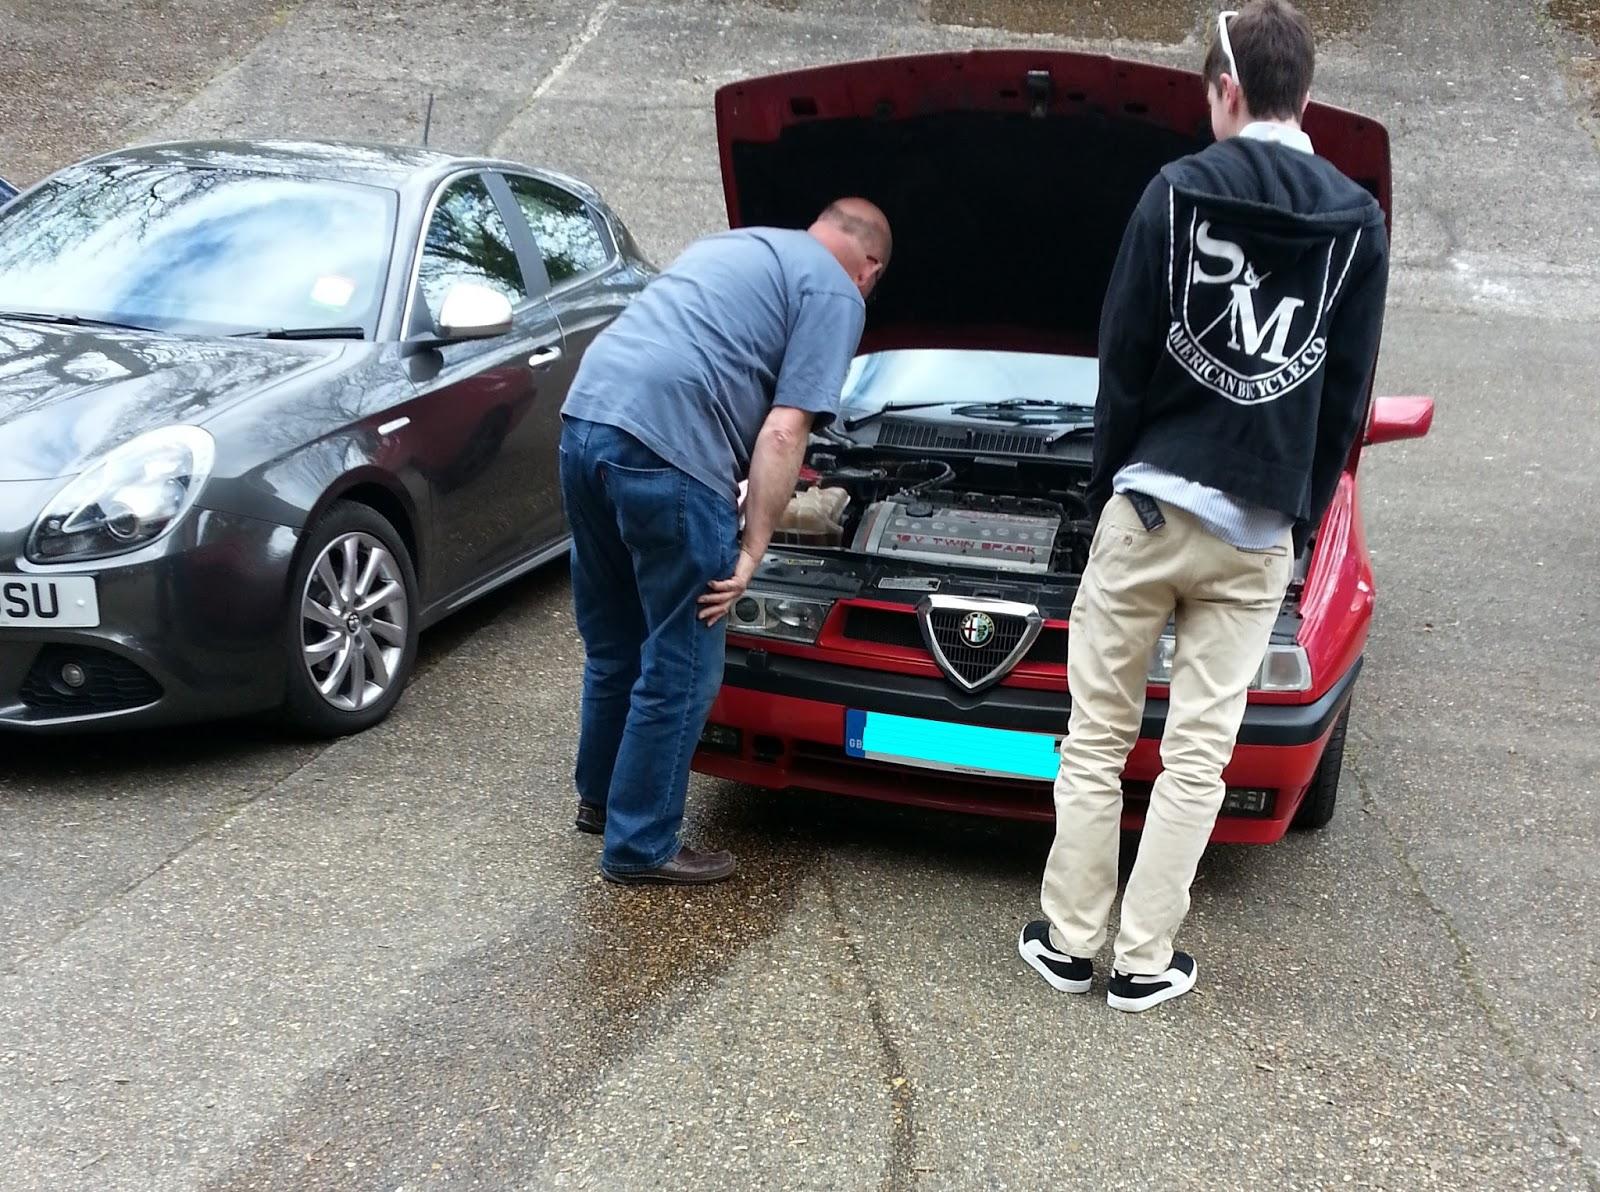 Broken down Alfa Romeo